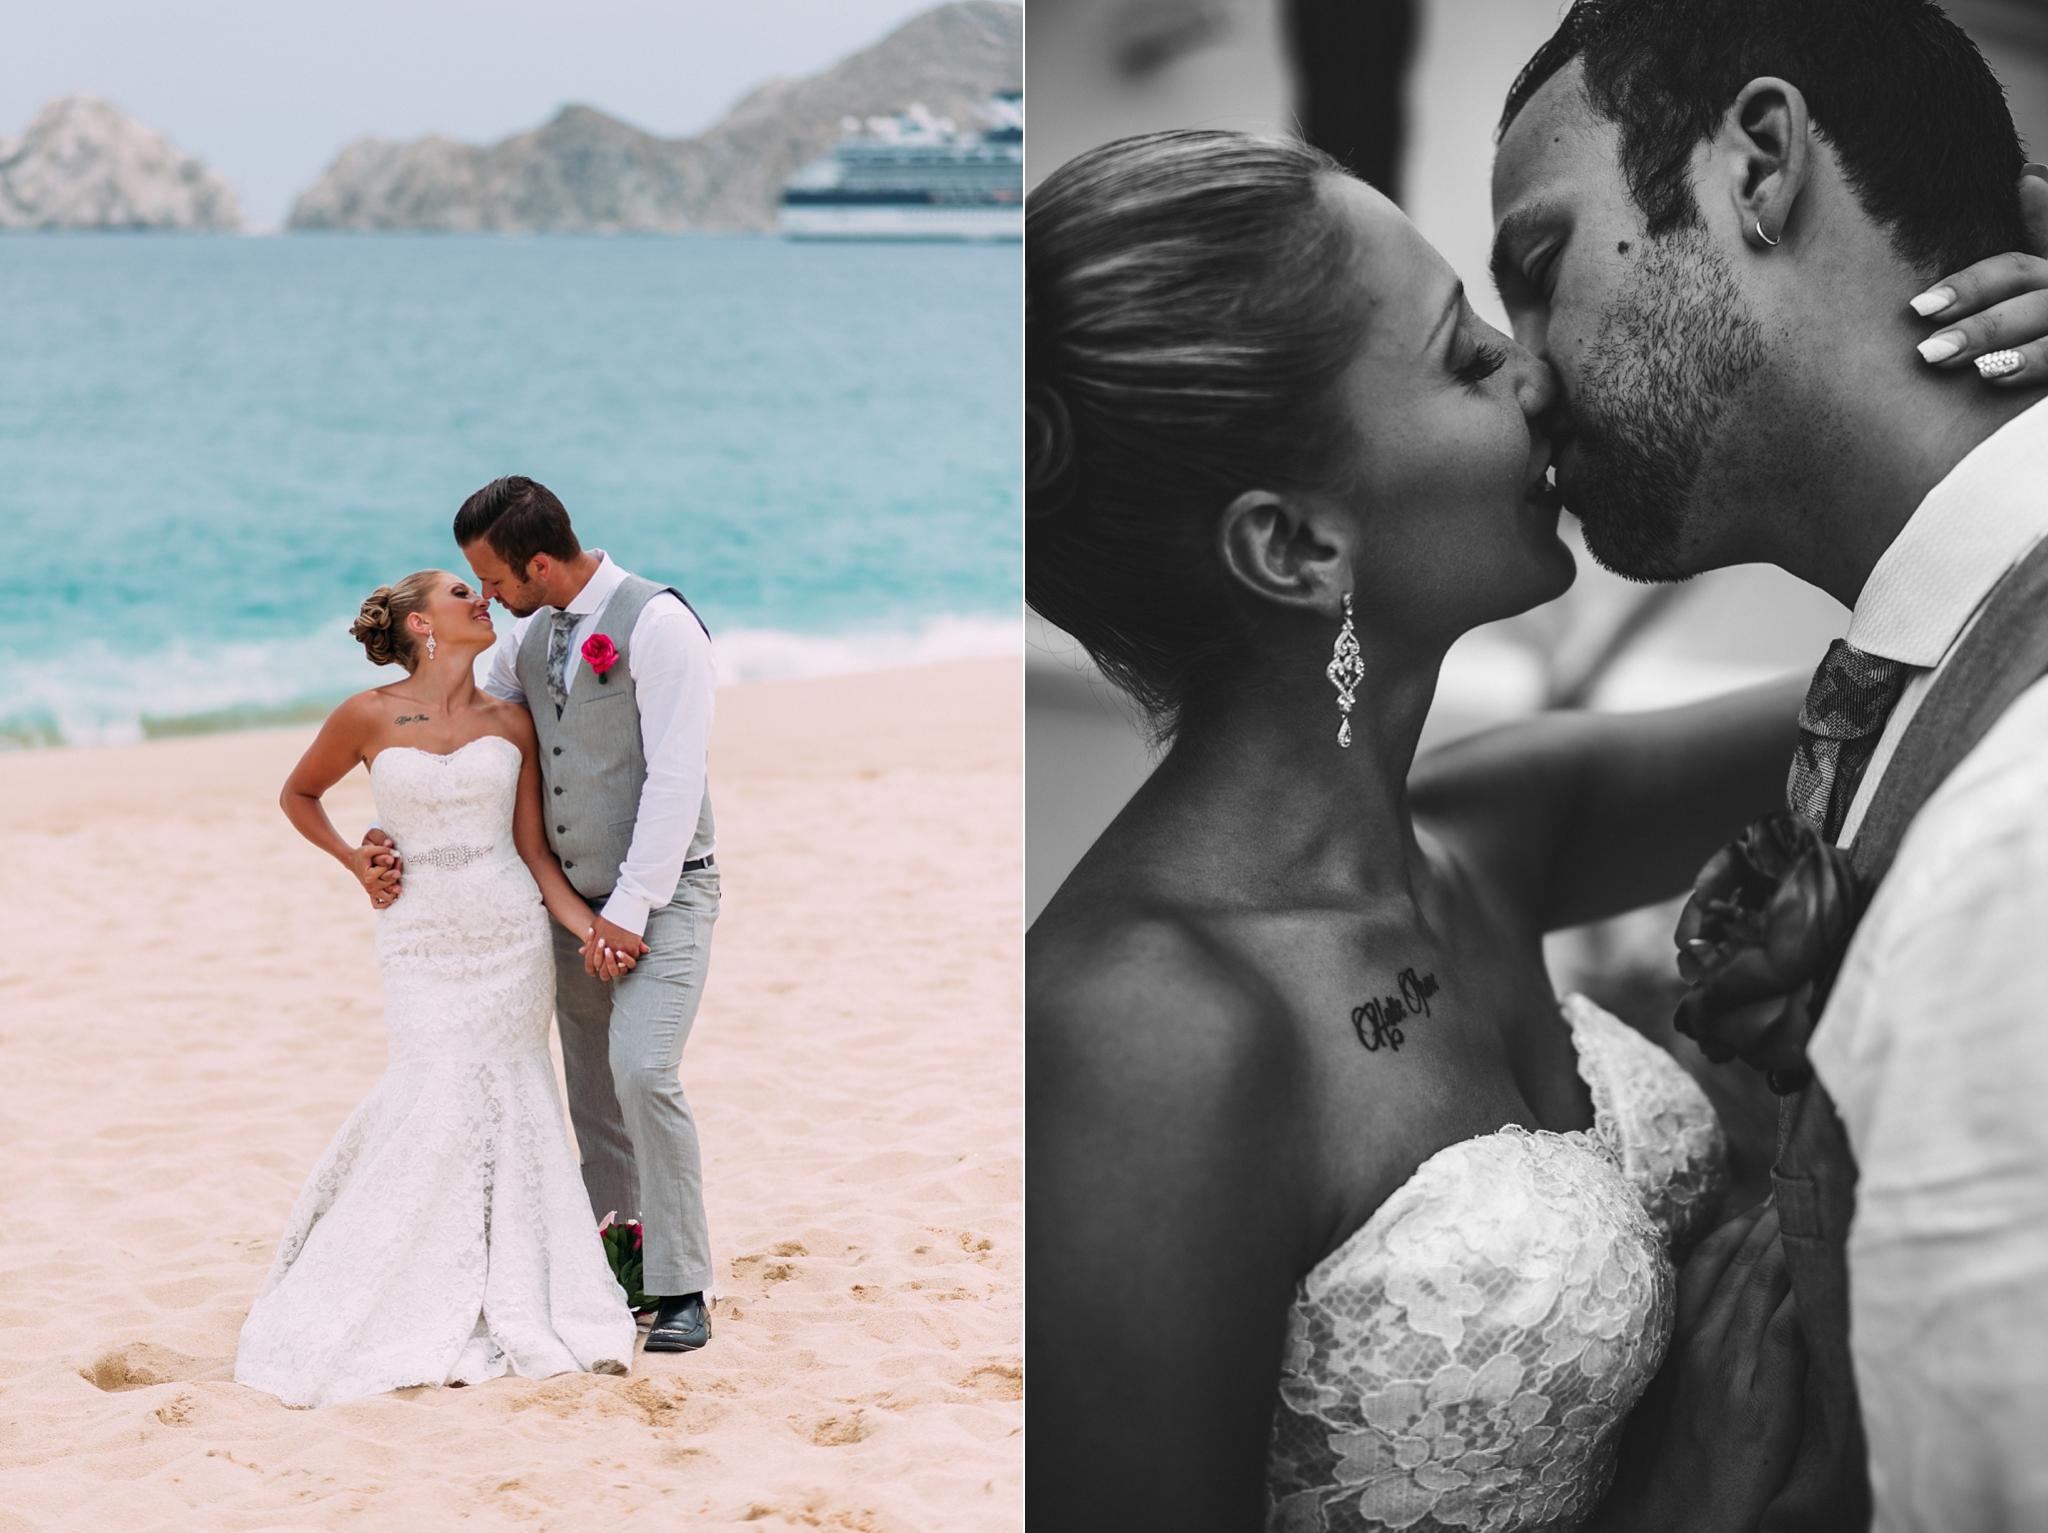 kaihla_tonai_intimate_wedding_elopement_photographer_1370